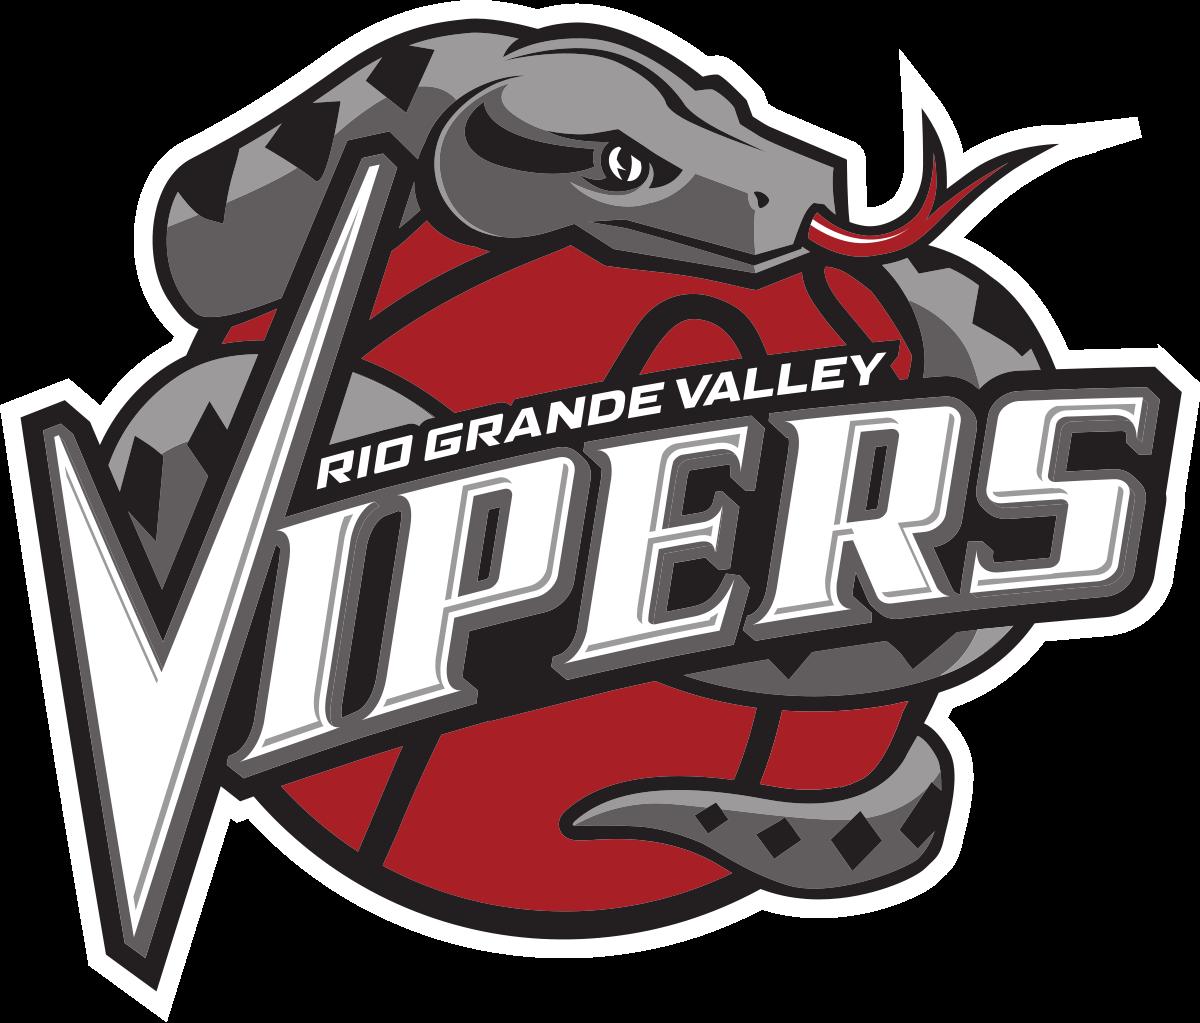 Logo Rio_Grande_Valley_Vipers